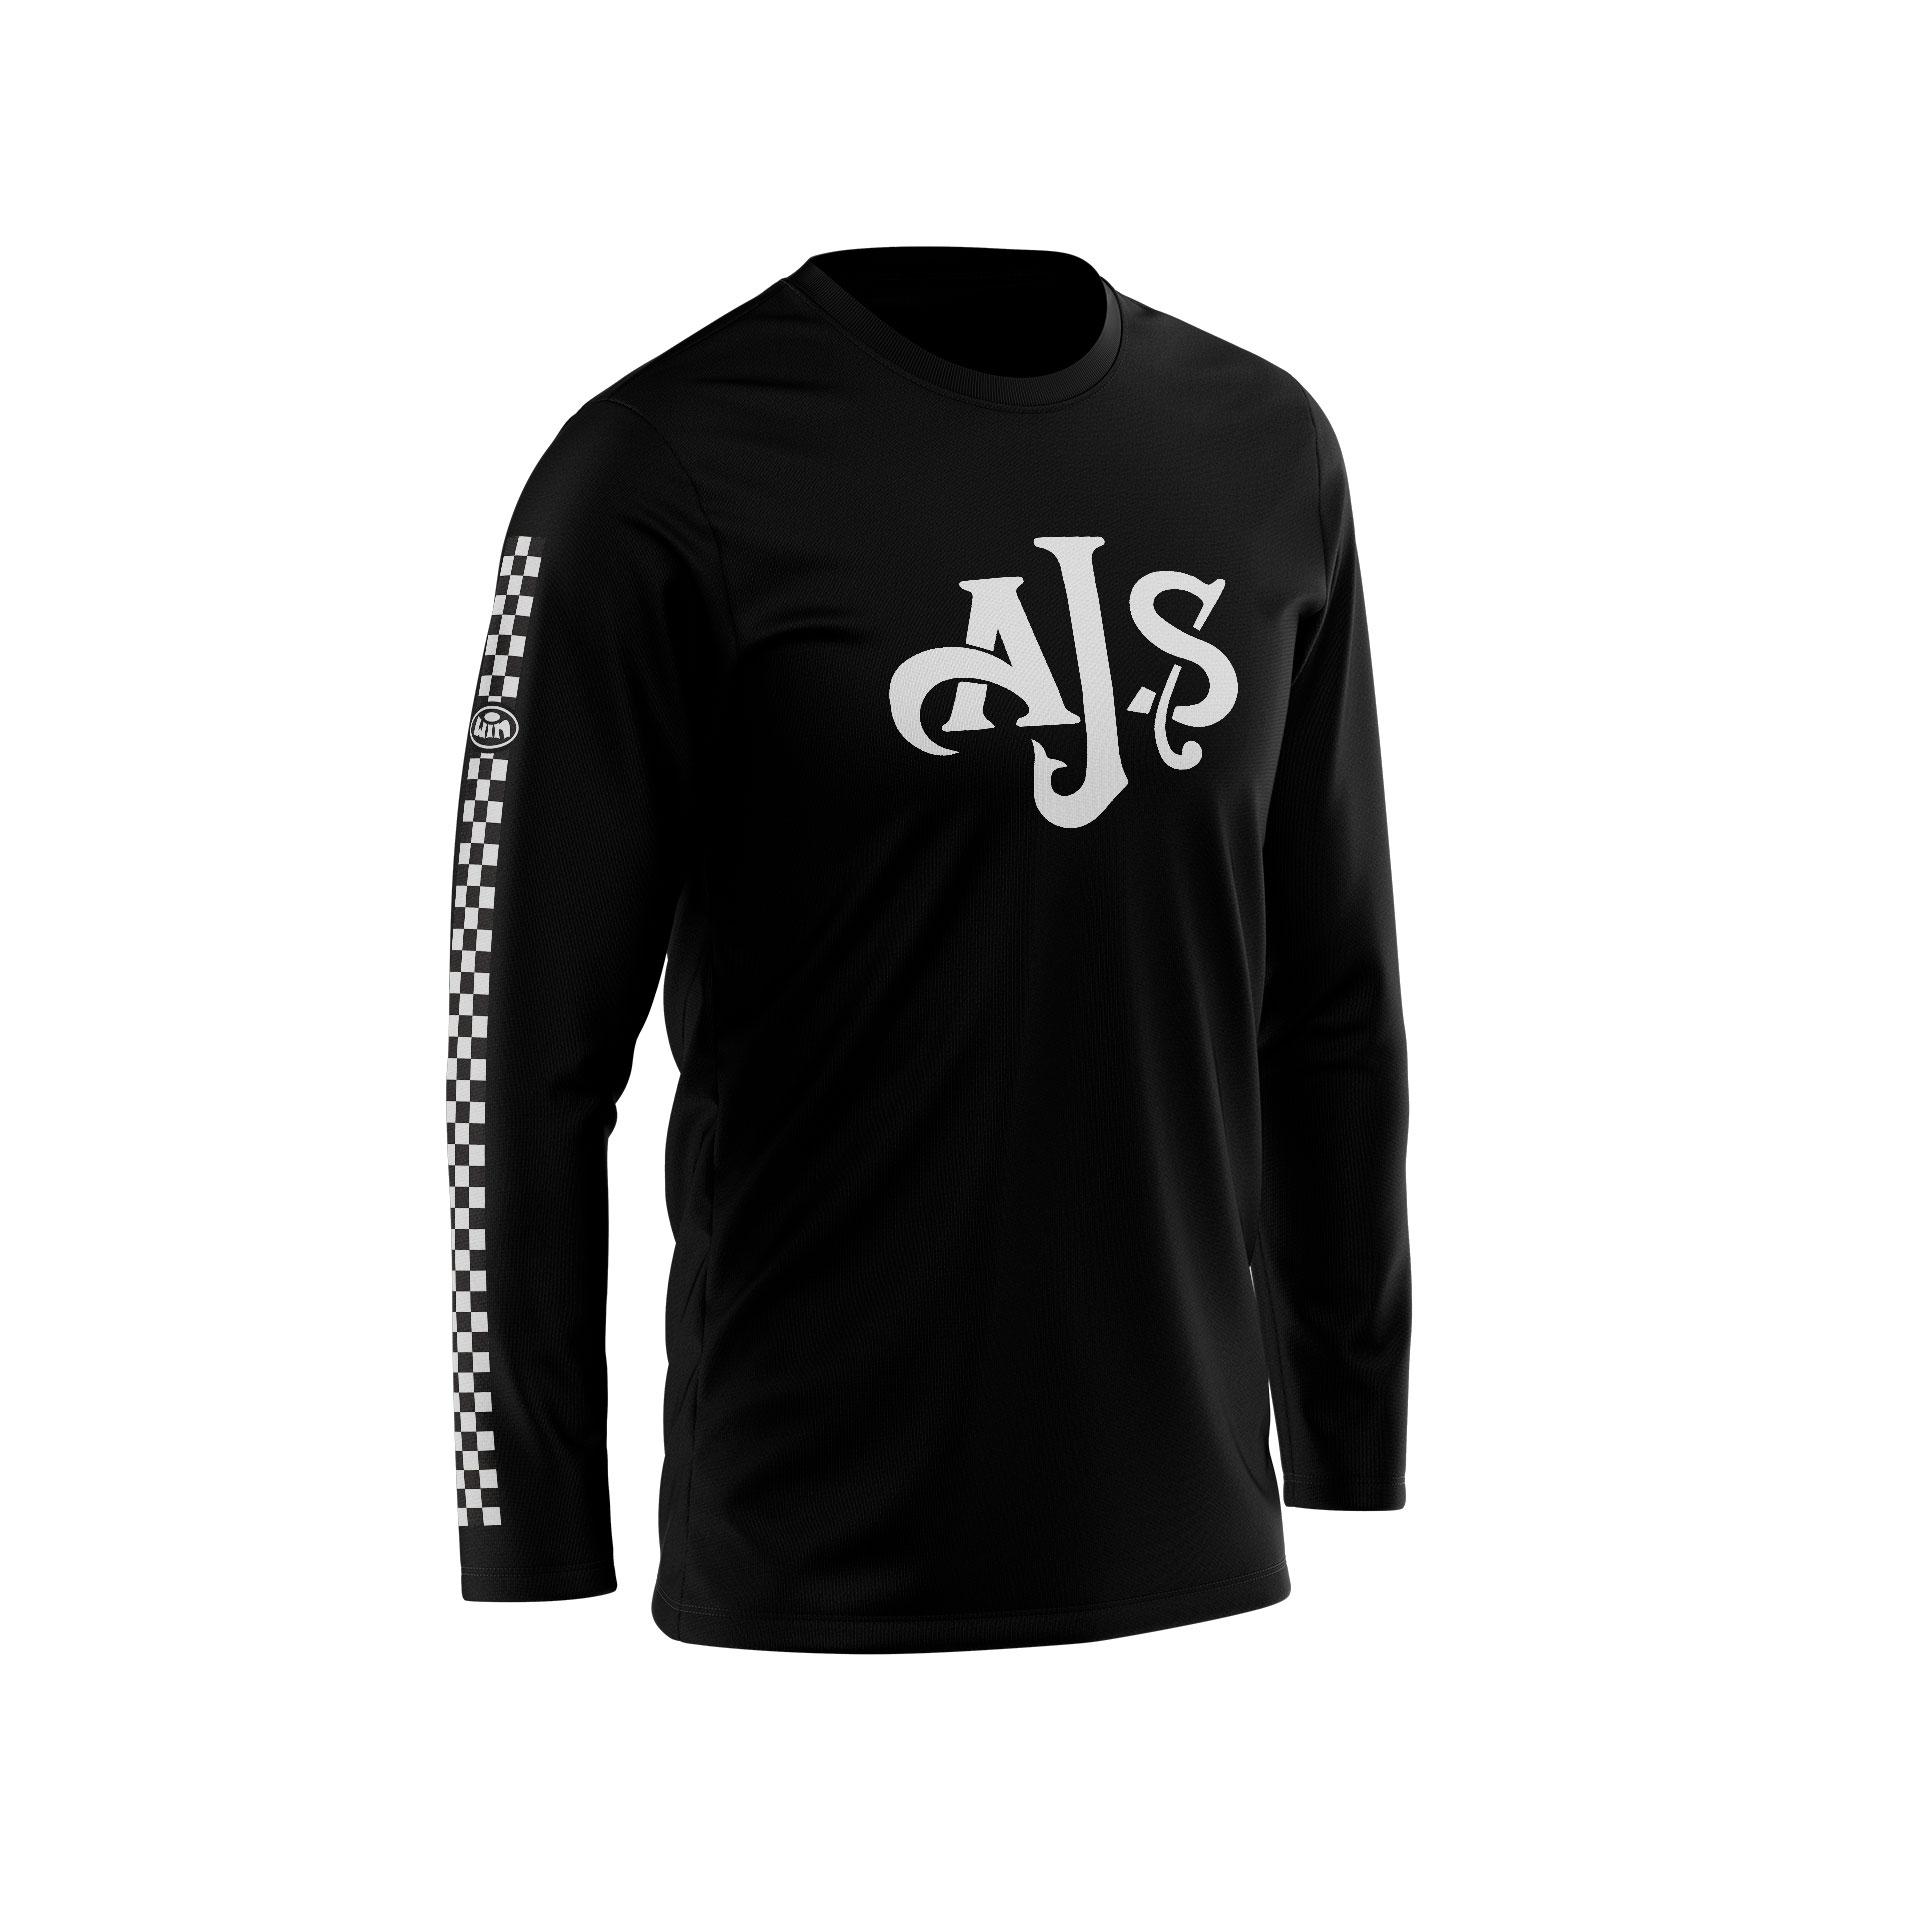 TSLS AJS Noir - Blanc